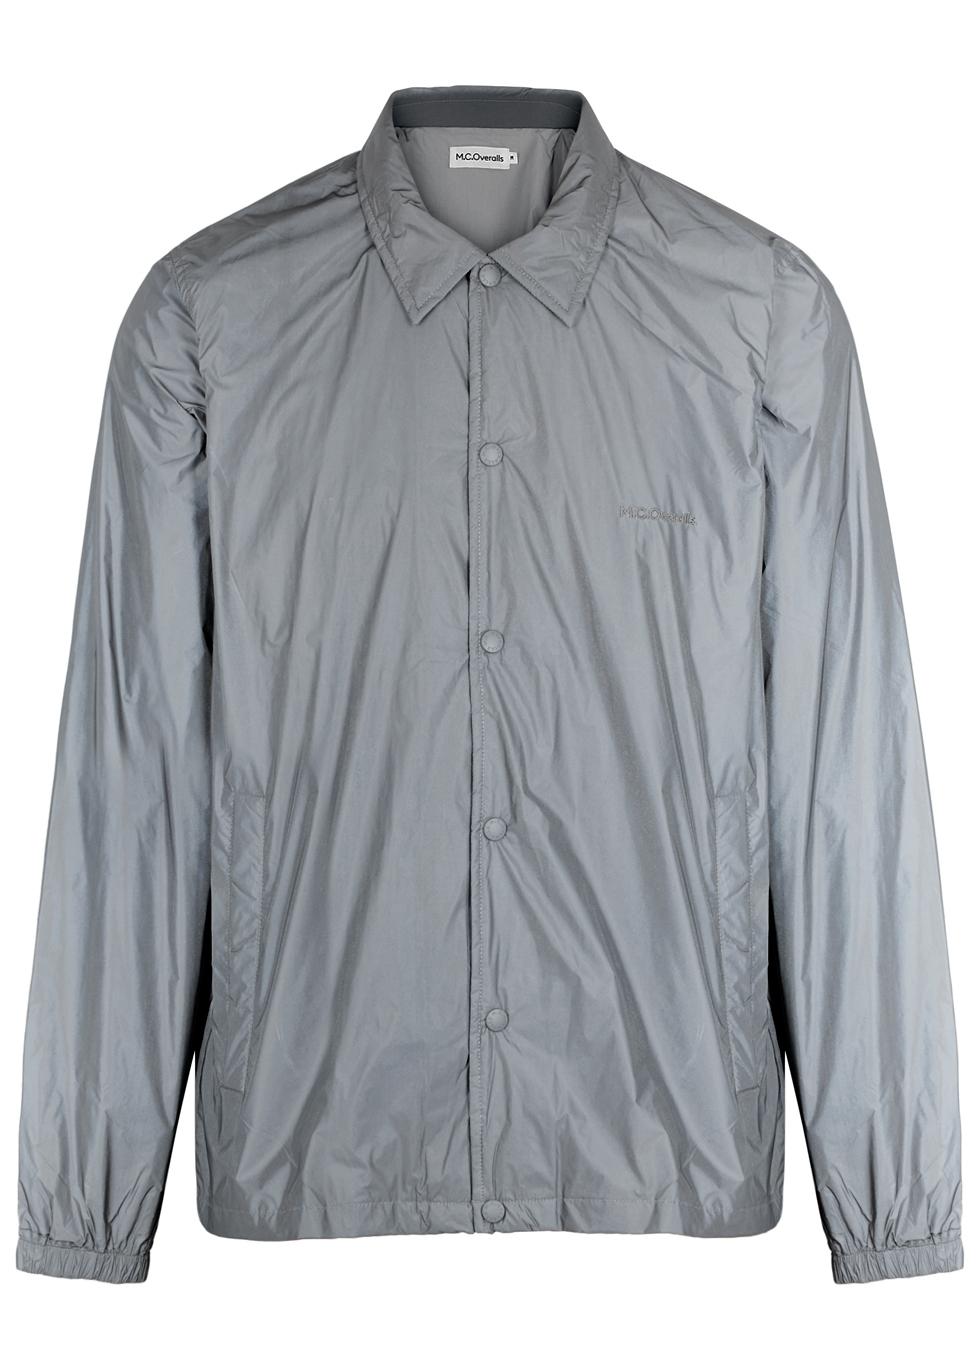 M.C. OVERALLS Grey Reflective Shell Jacket